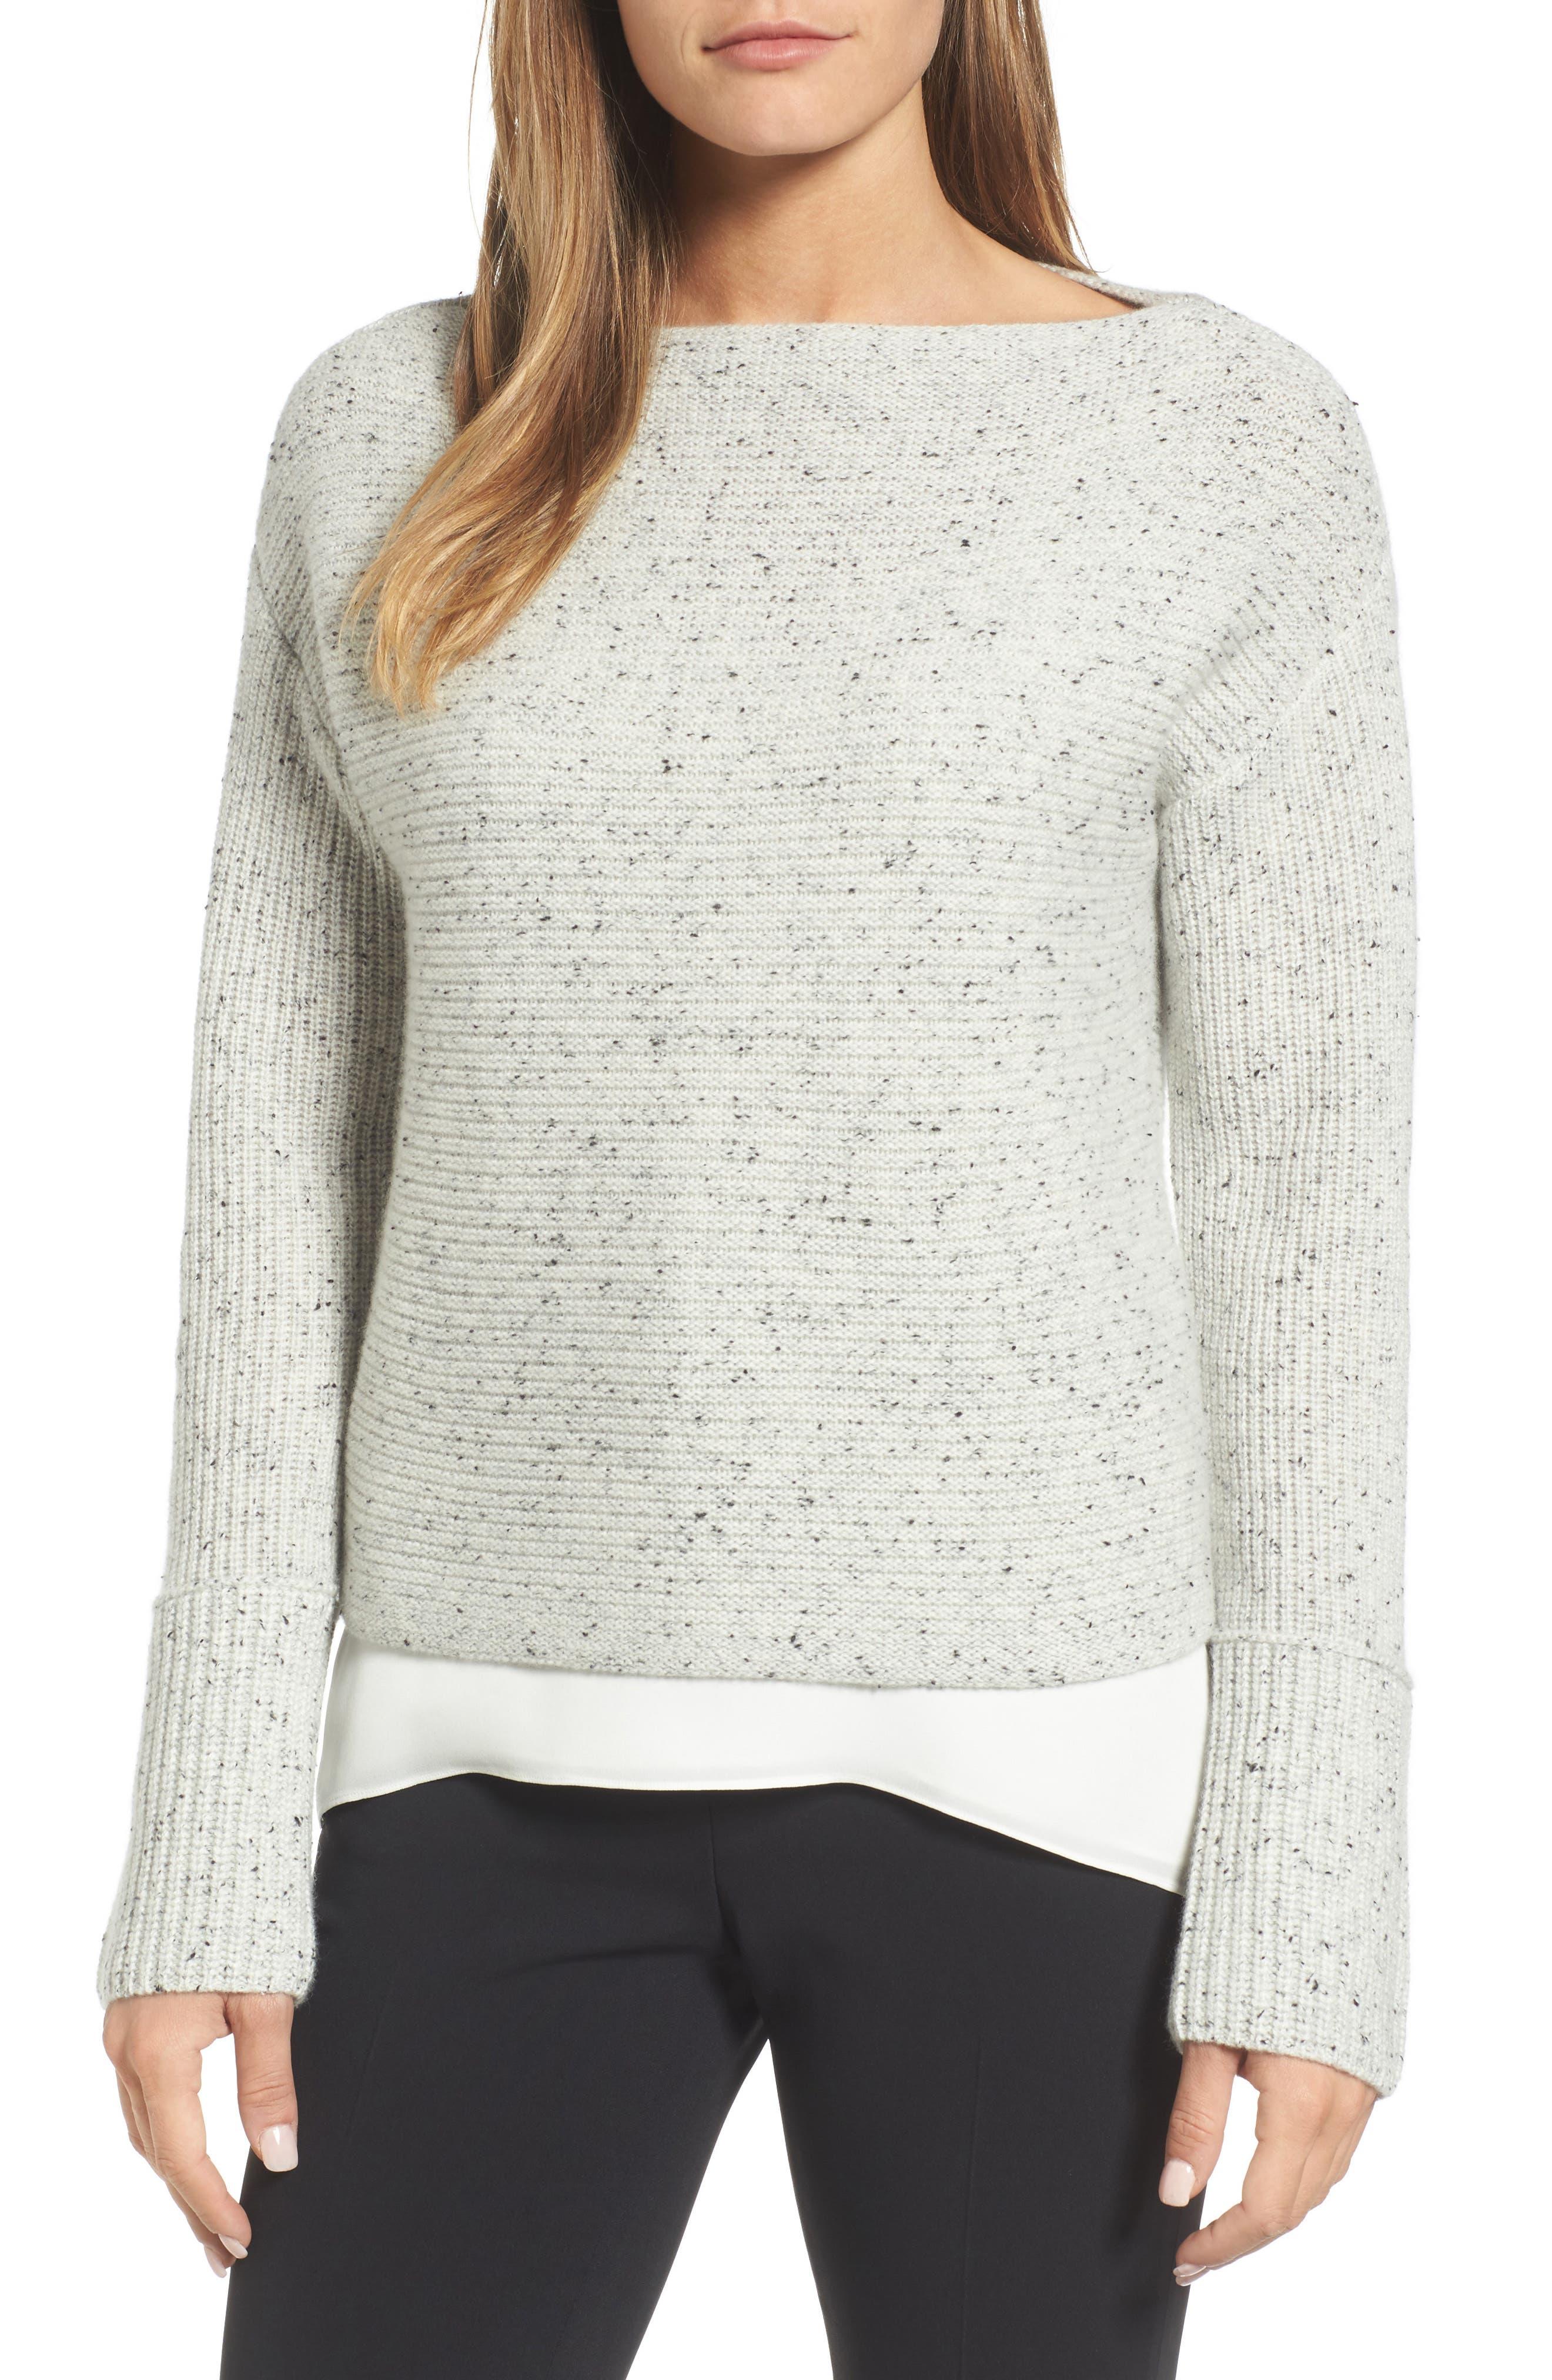 Main Image - Nordstrom Signature Textured Cashmere Sweater